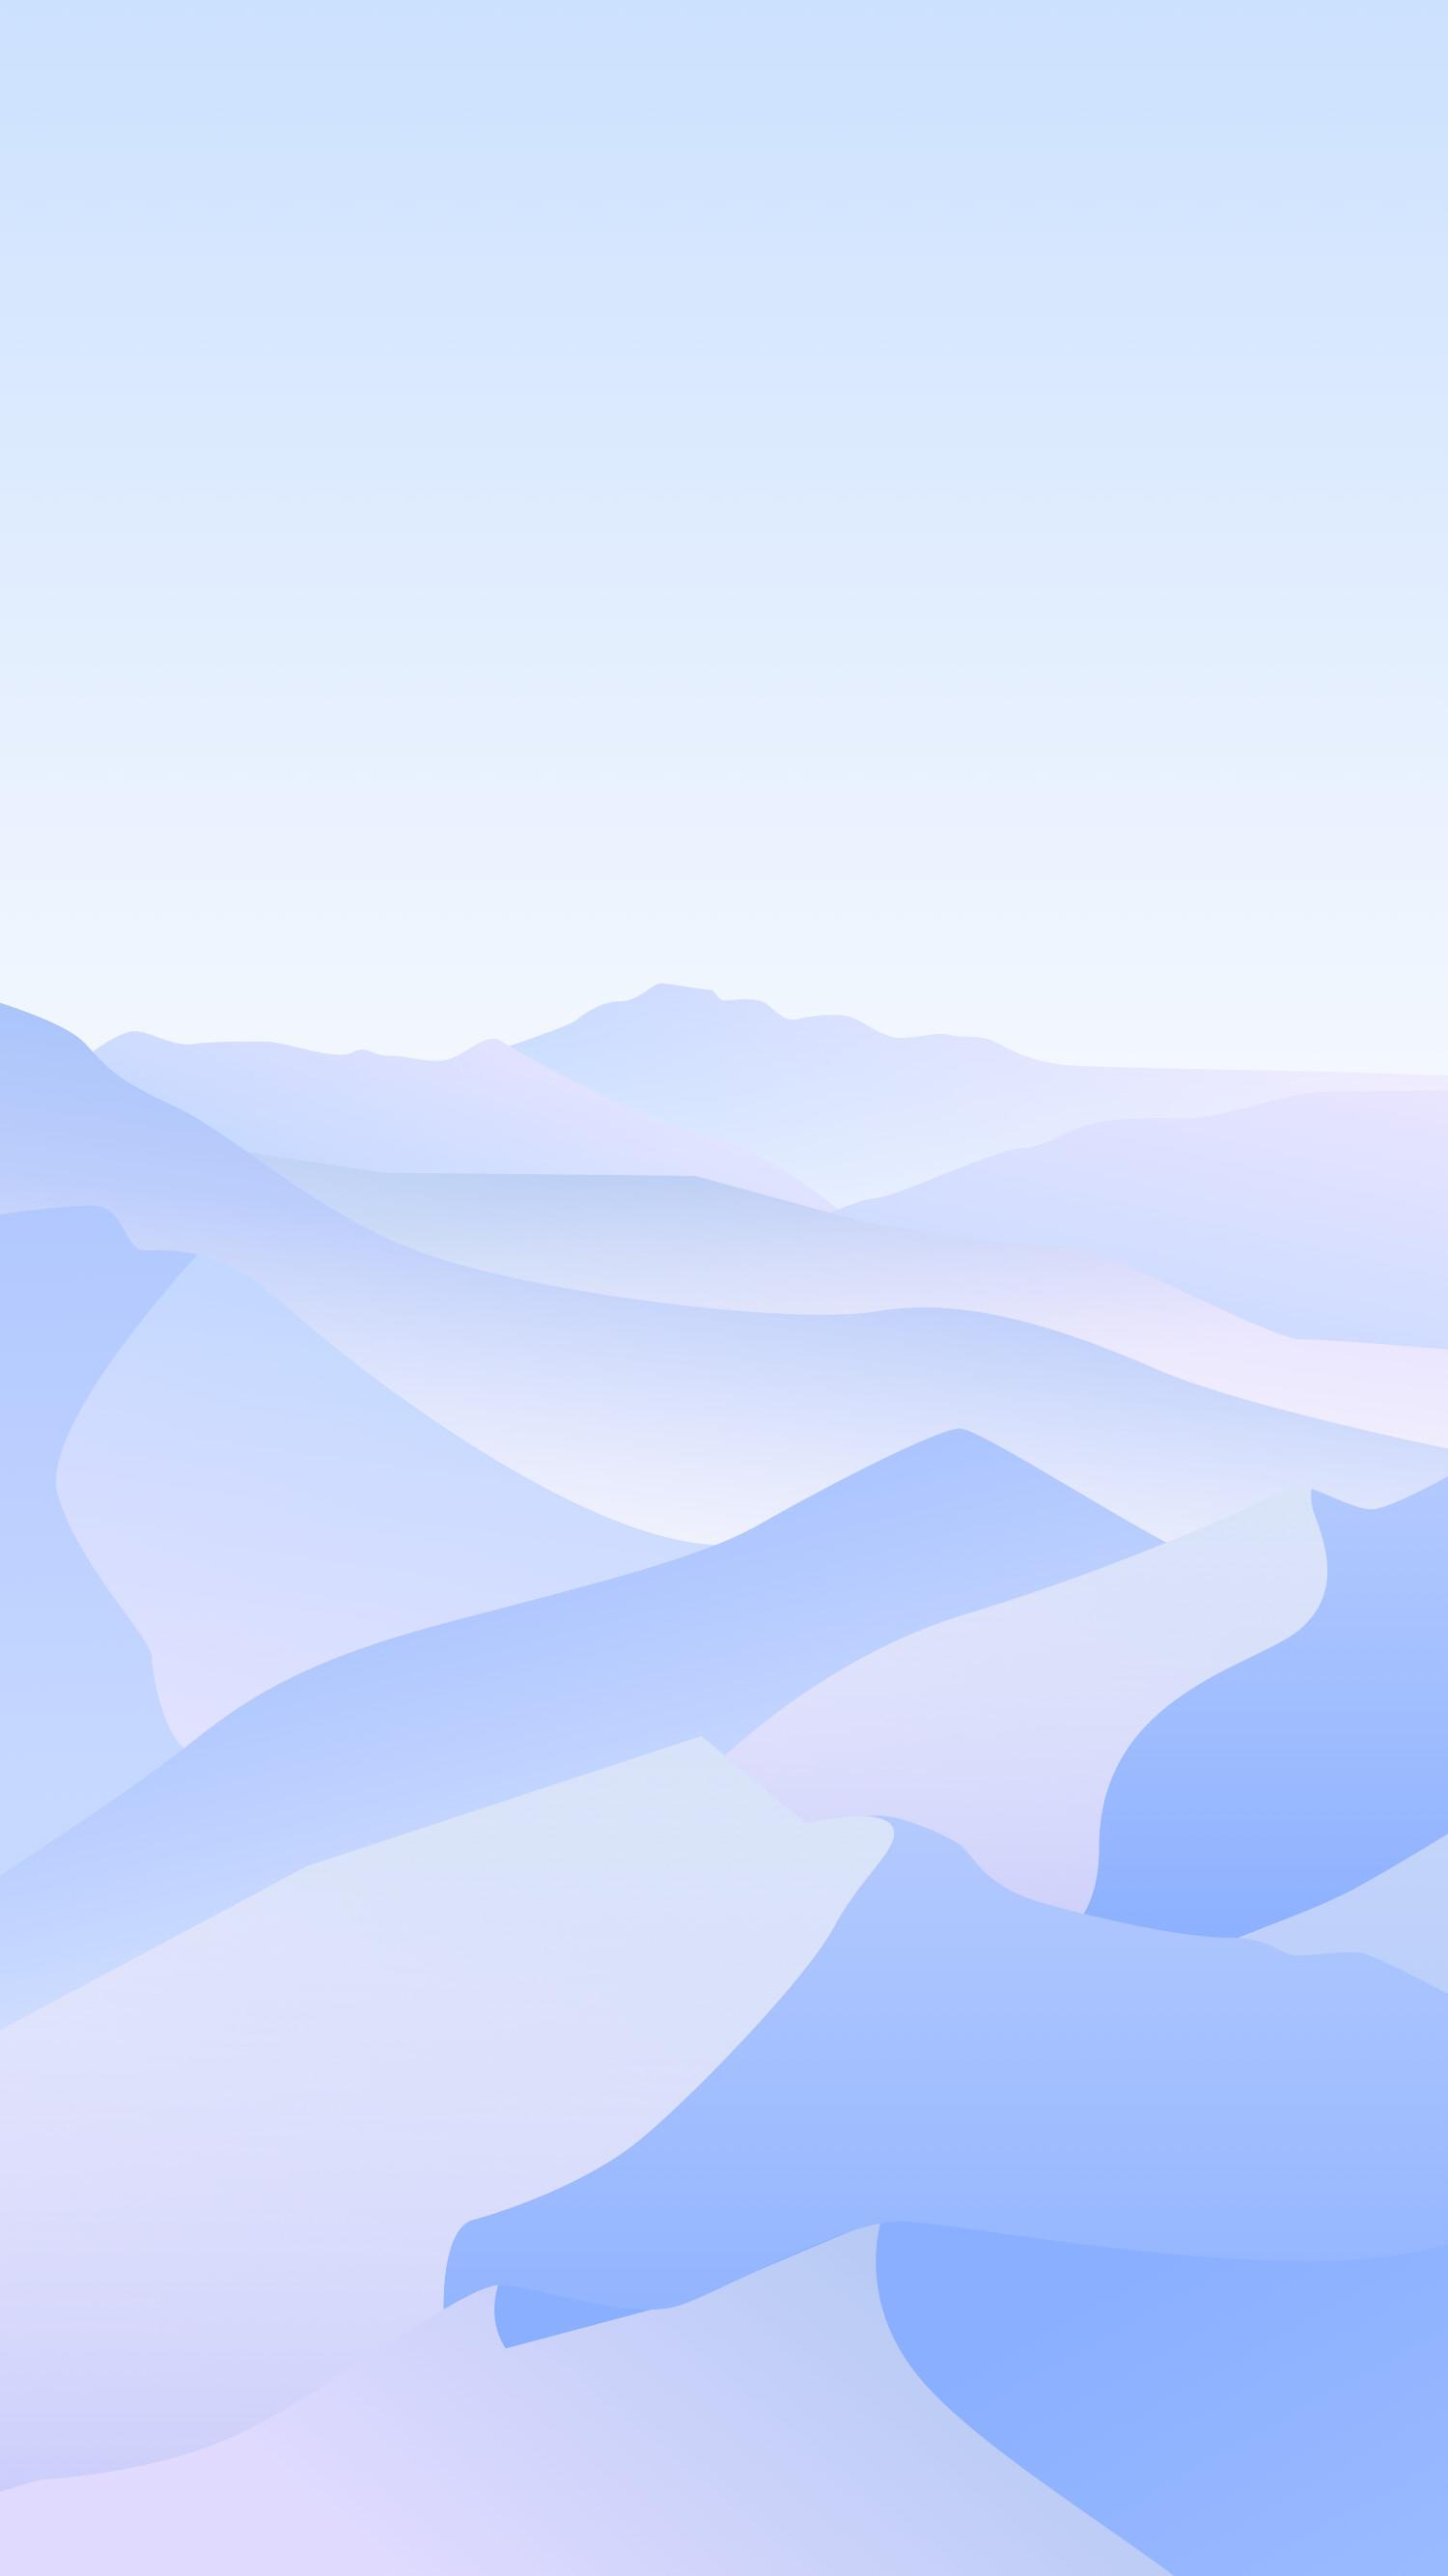 1500x2668, Pin By Vahag Hakhverdyan On Iphone 5s Wallpapers - Minimalist Wallpaper Iphone - HD Wallpaper